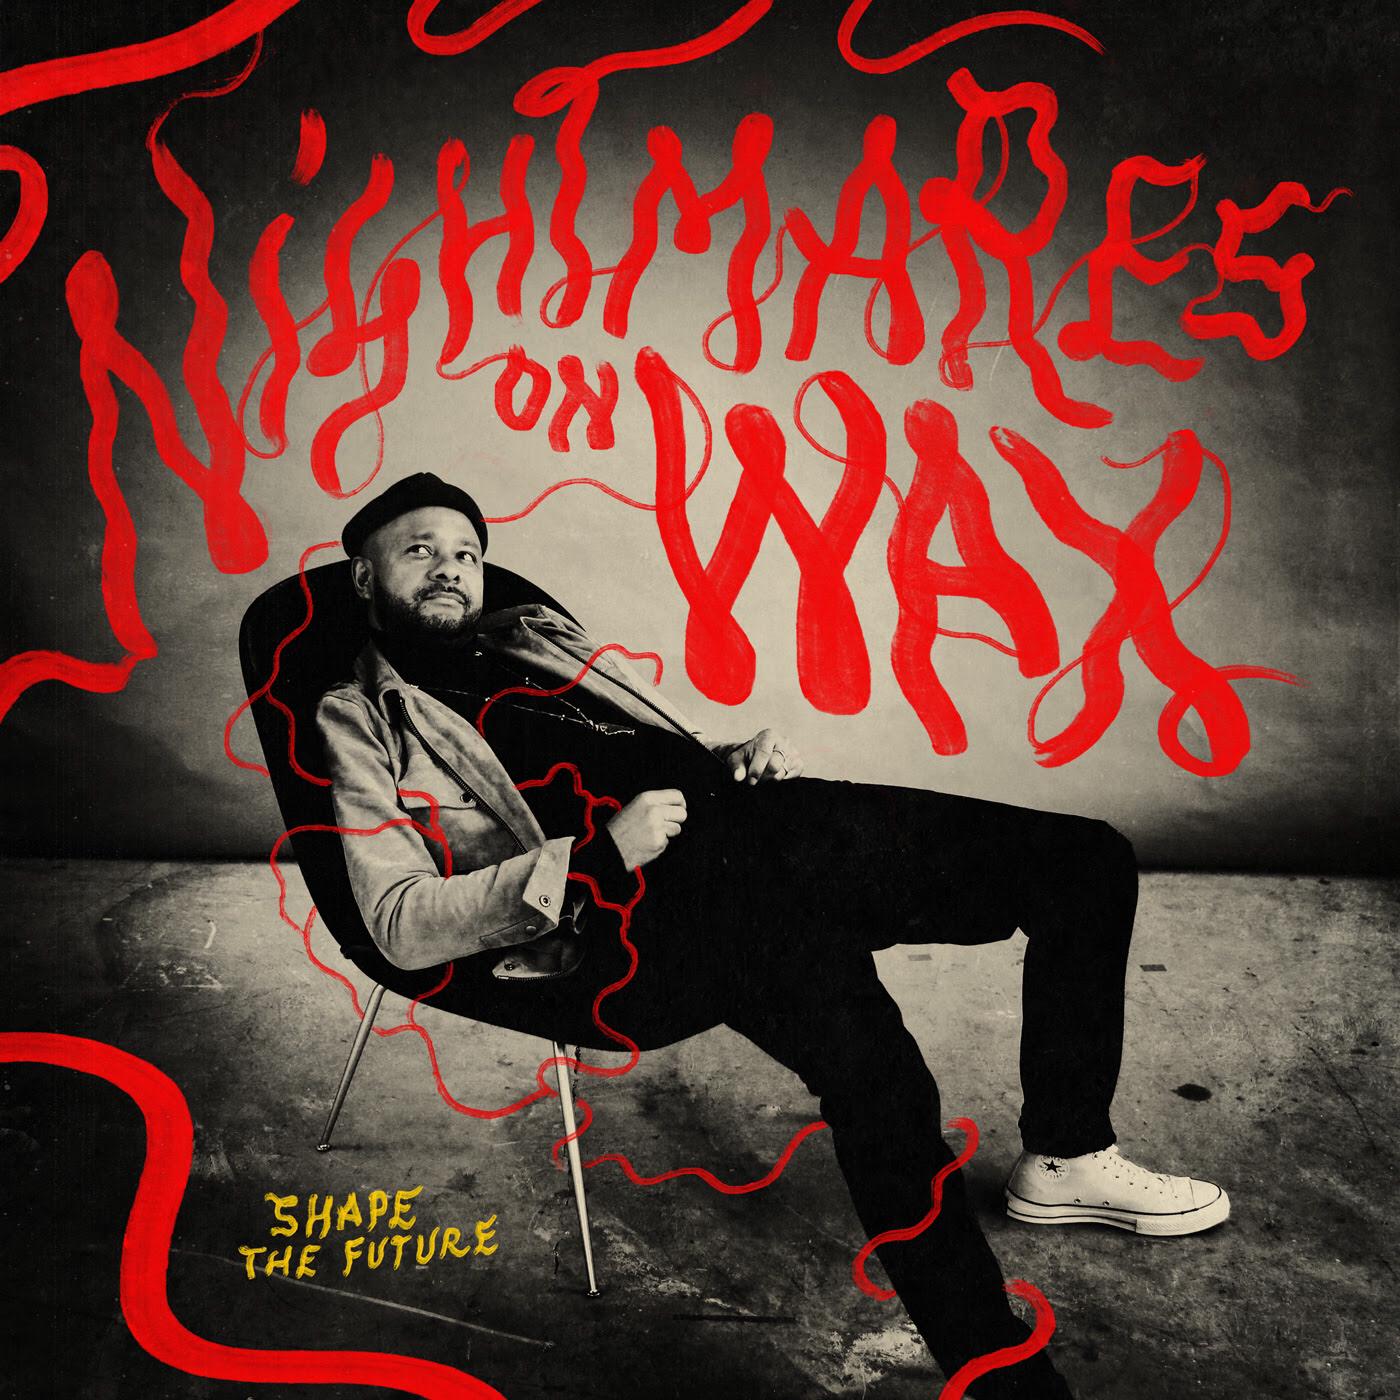 Nightmares on Wax album cover